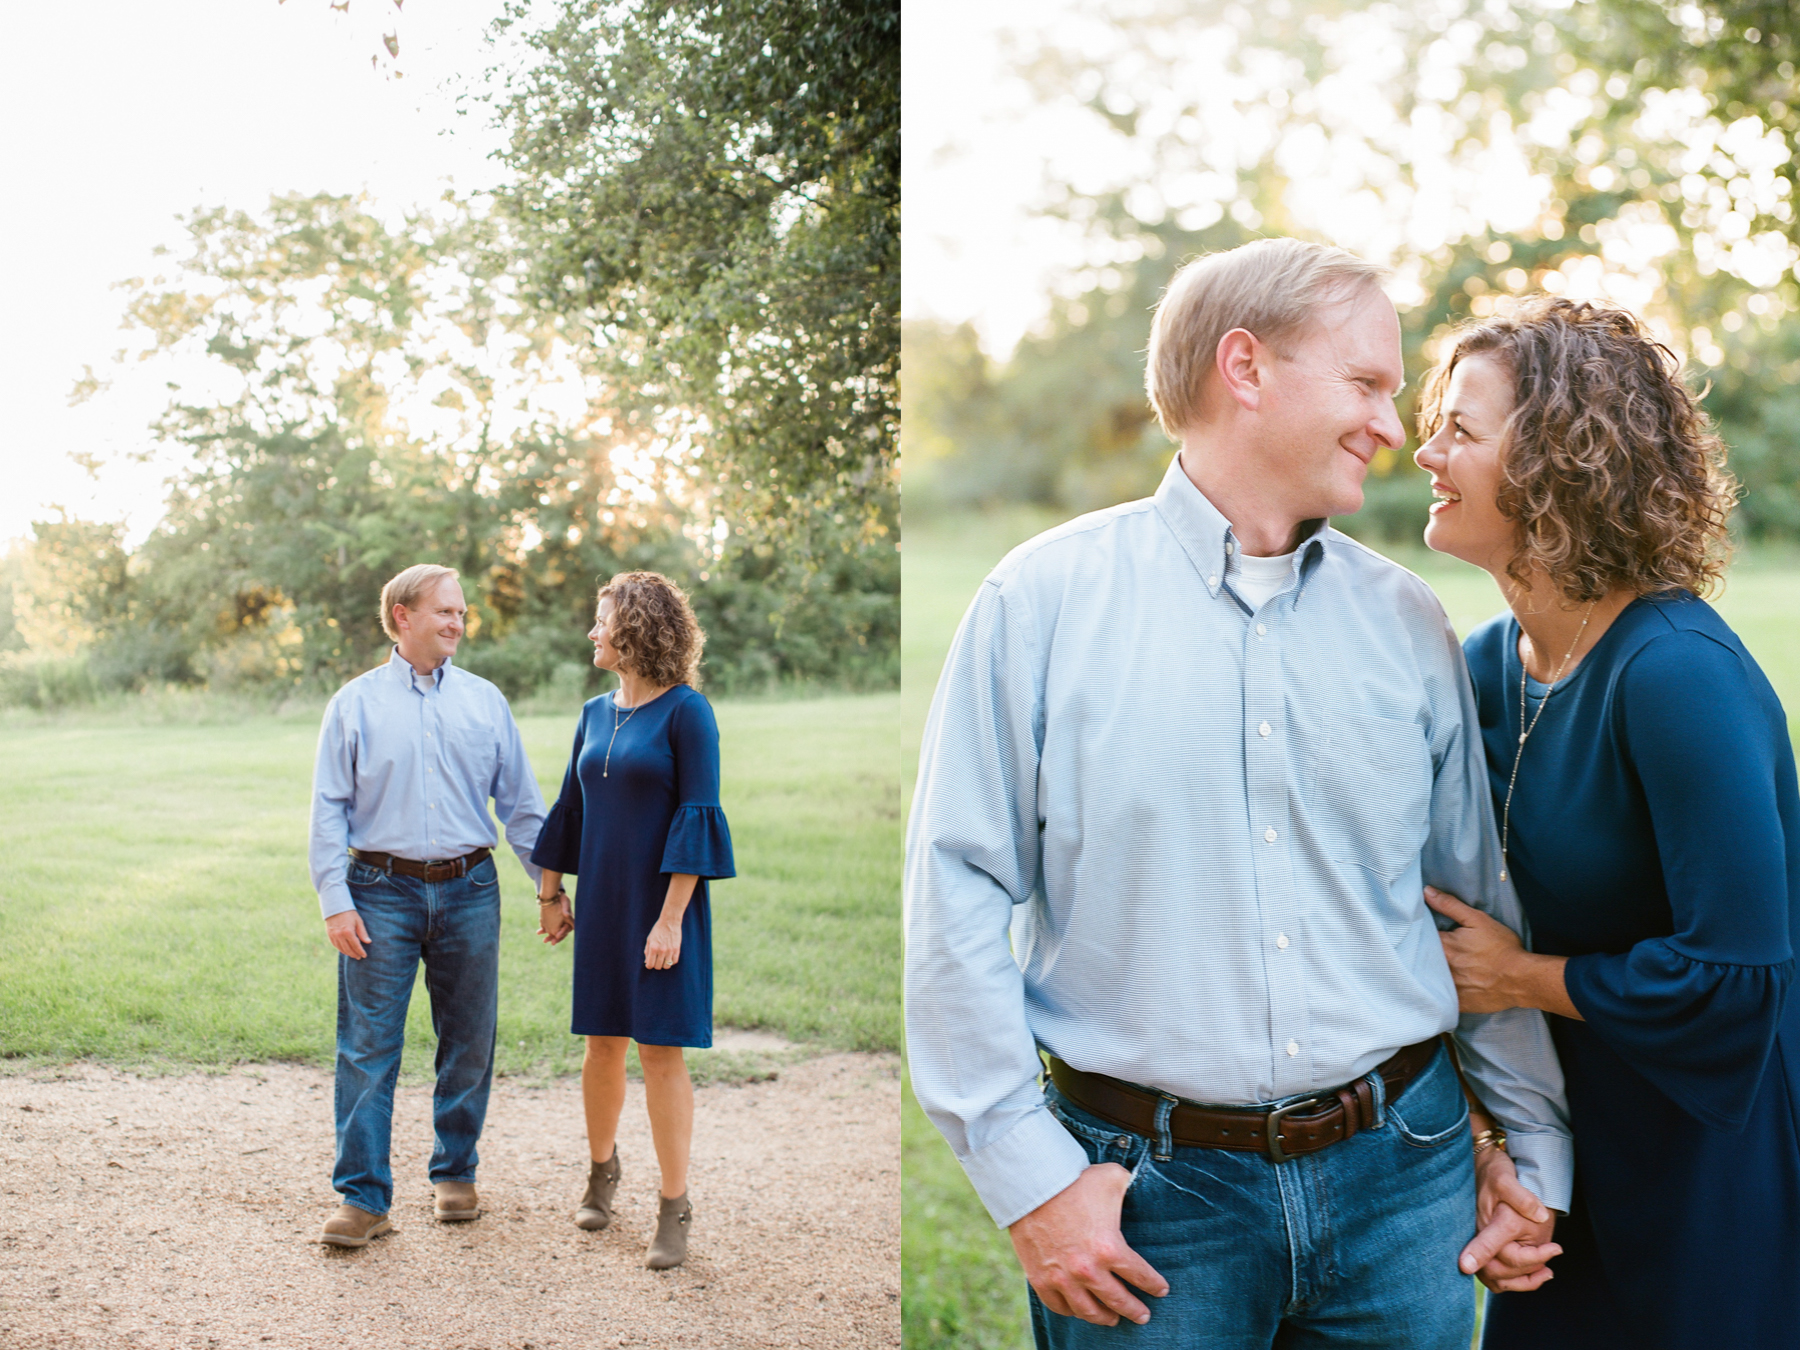 Jackson Madison MS family photographer collage 3.jpg